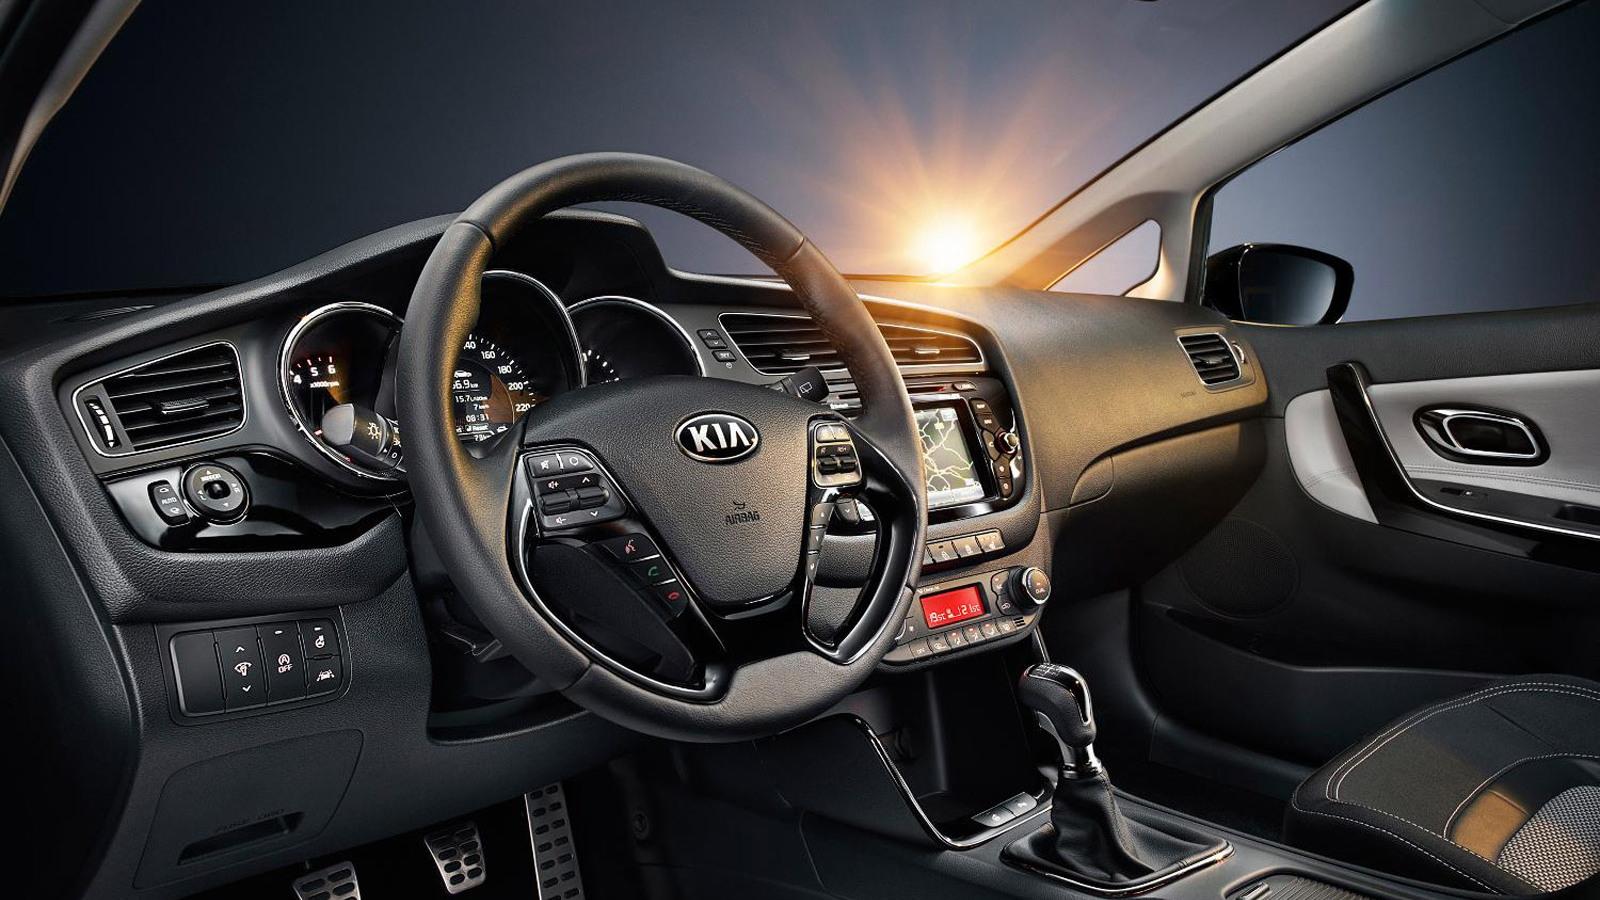 2012 Kia Cee'd Hatchback